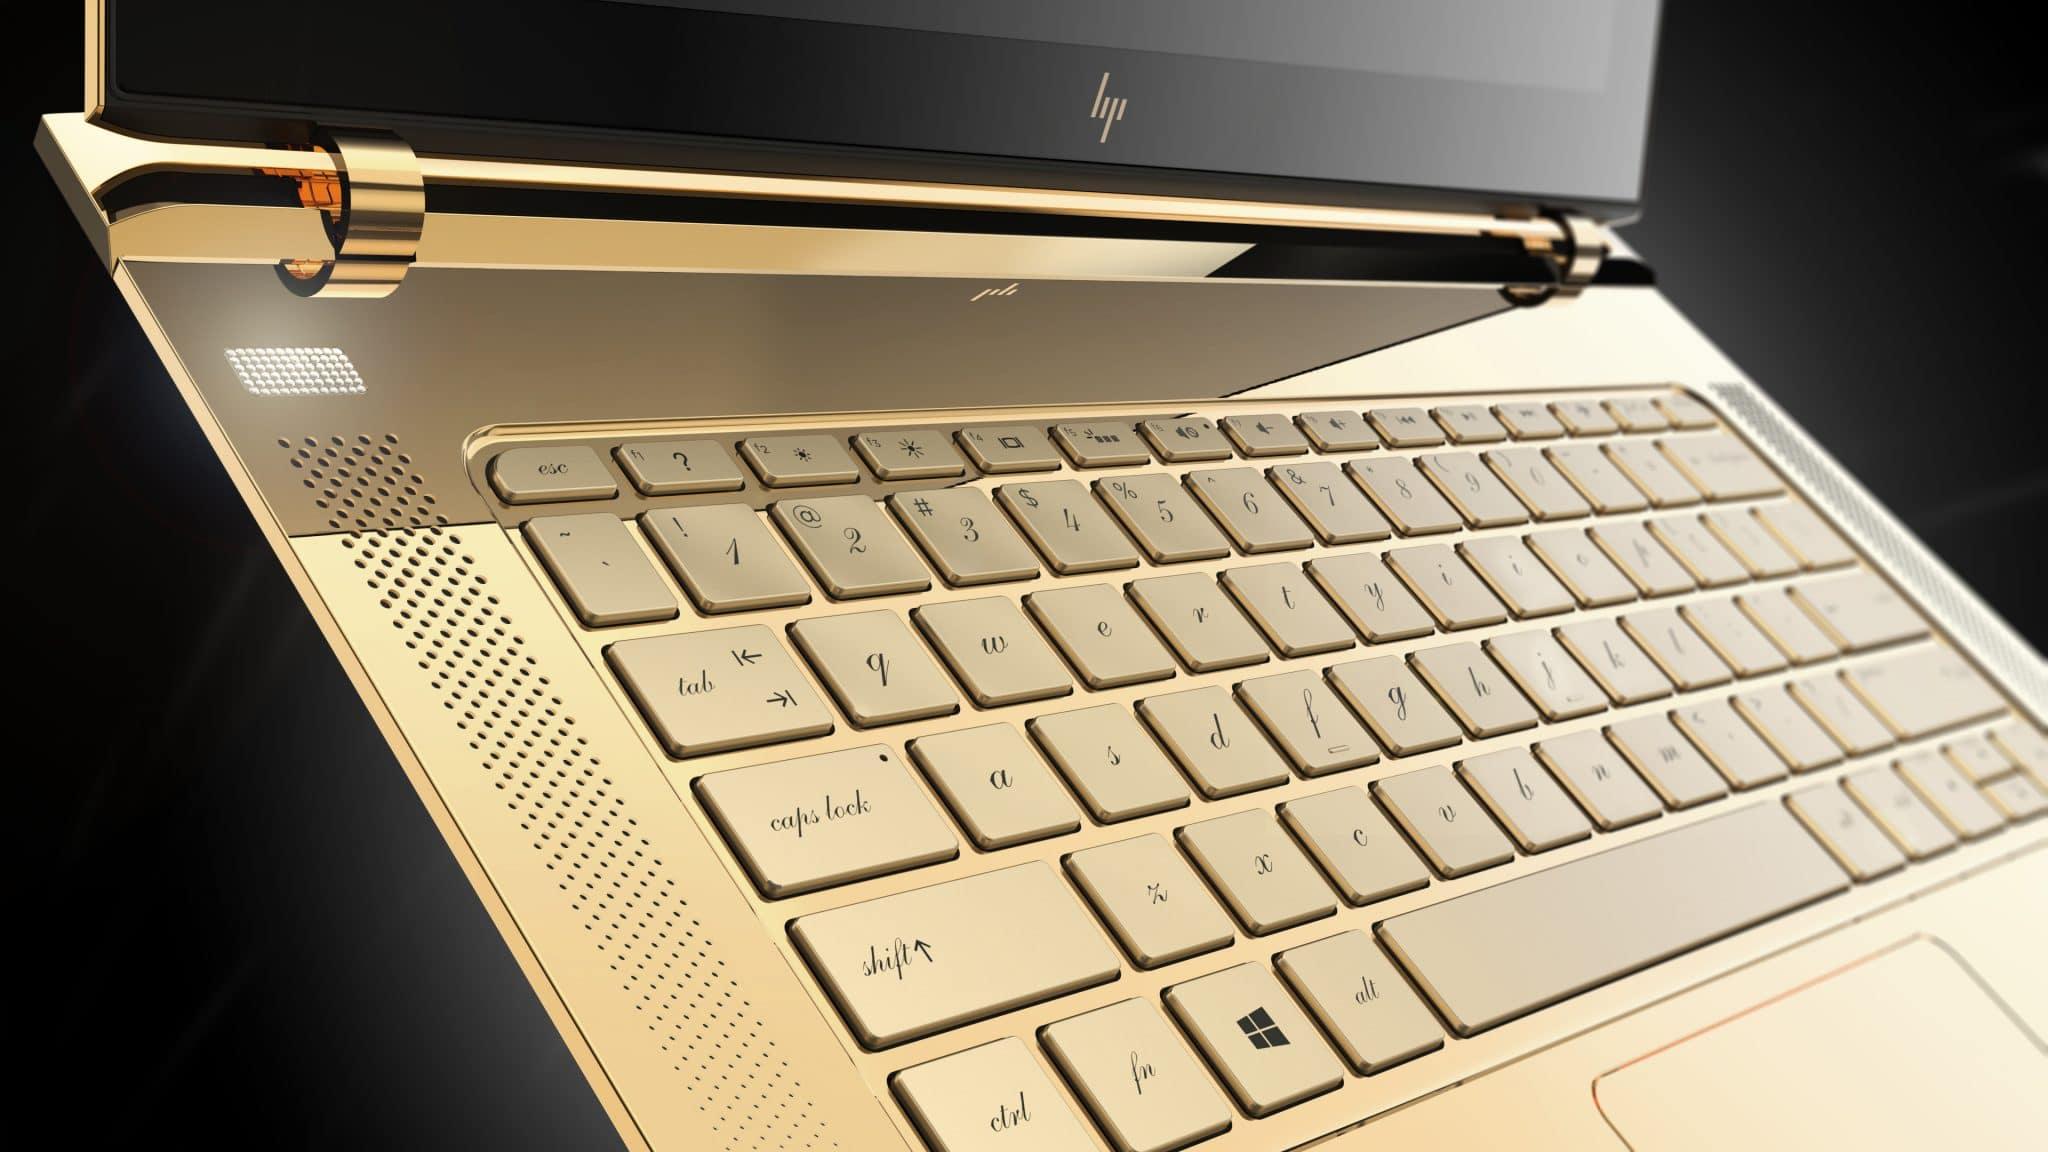 Noul HP Spectre: De mult n-am mai văzut un laptop așa frumos